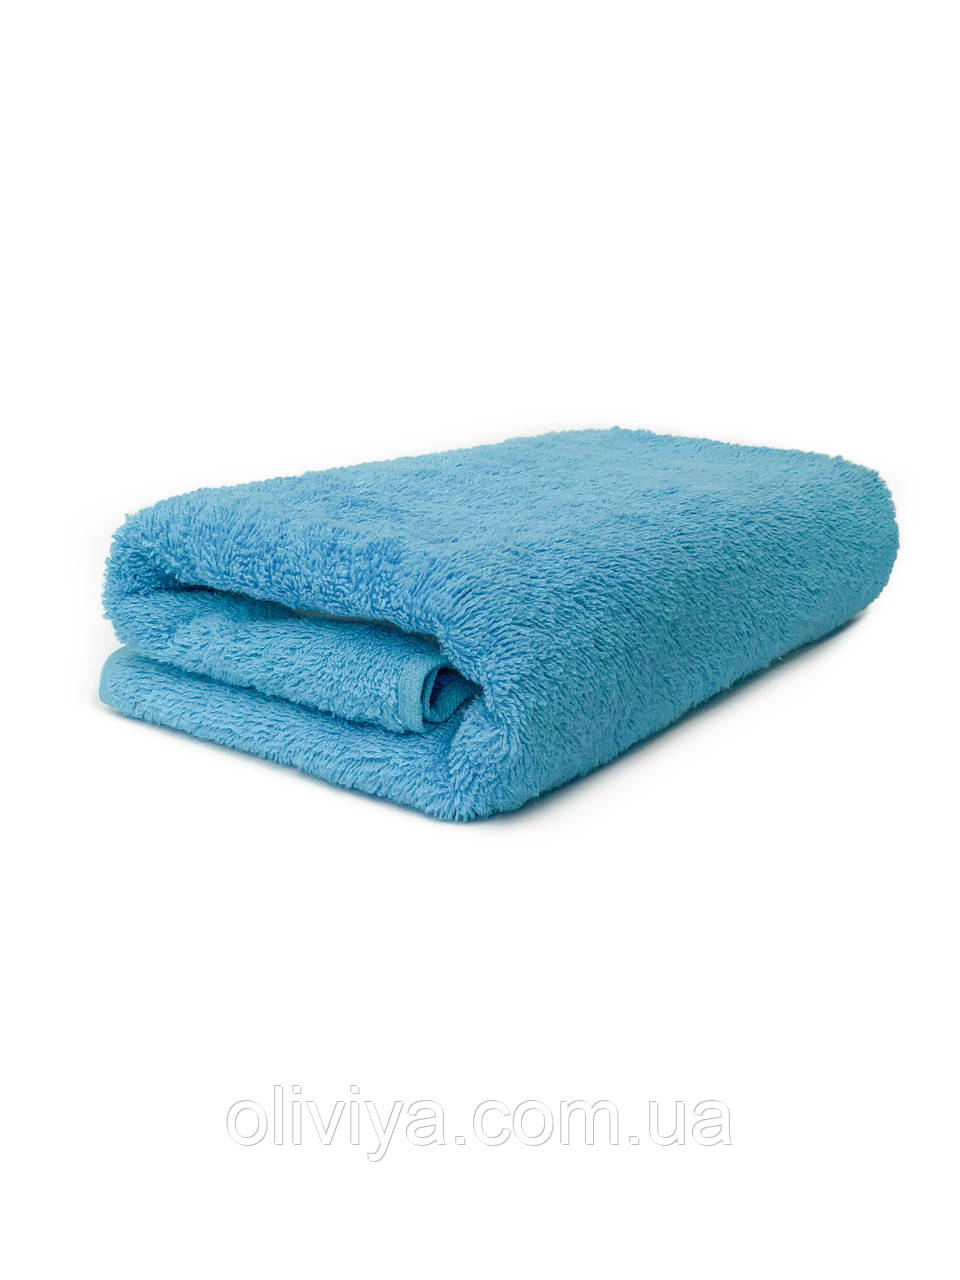 Рушник для рук 40x70 Powder Blue